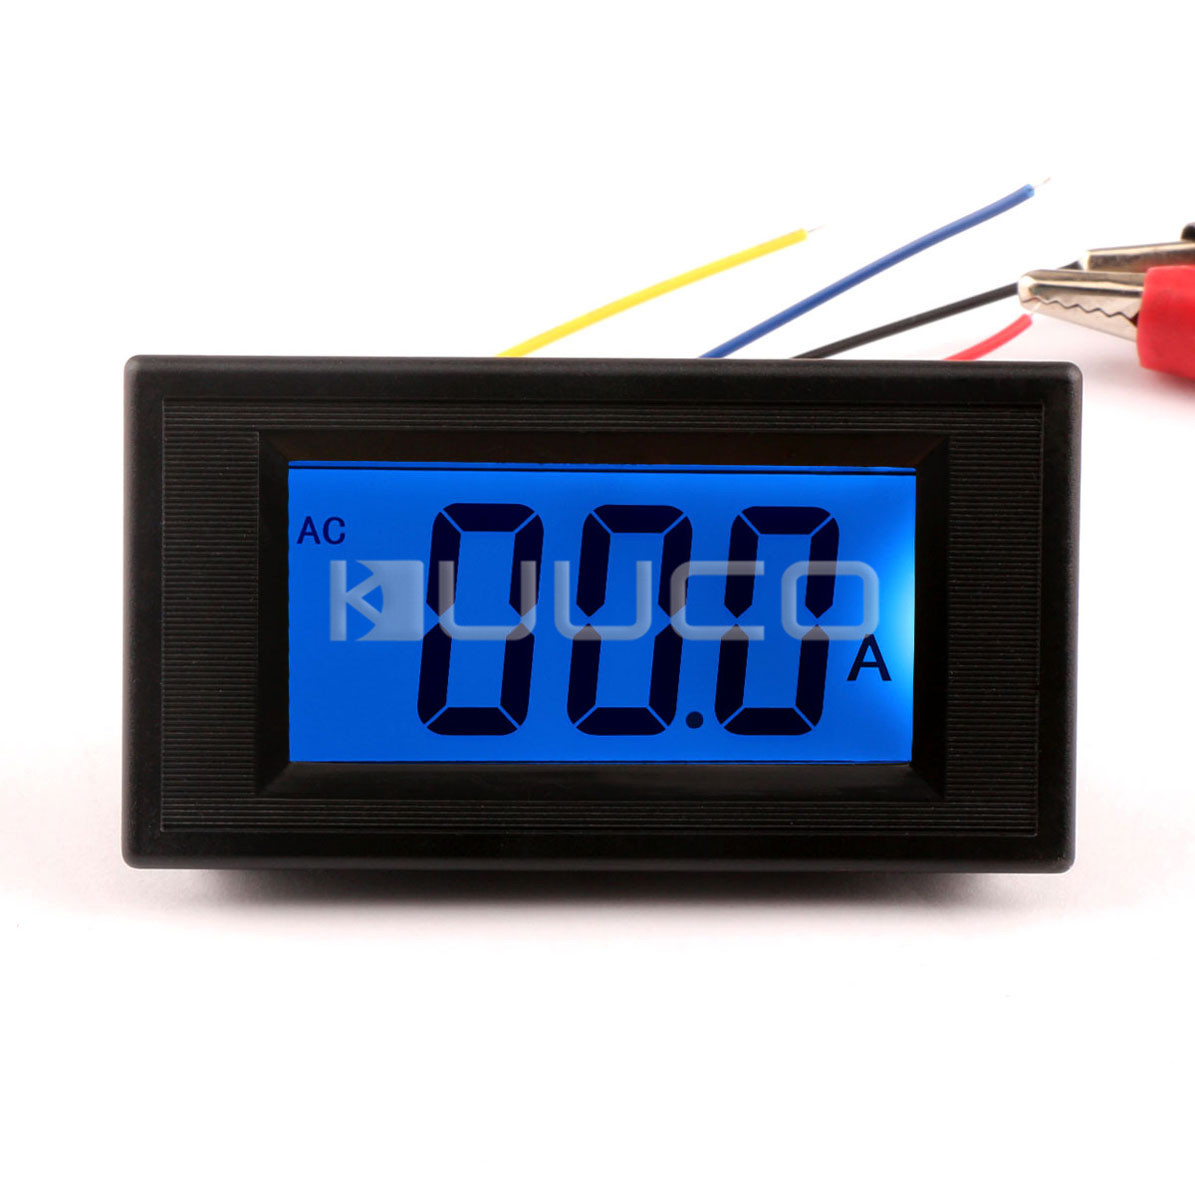 digital meter ac 0 100a blue lcd display digital ammeter ac dc 8v 12v amp meter gauge ampere meter shunt resistor in instrument parts accessories from  [ 1195 x 1195 Pixel ]